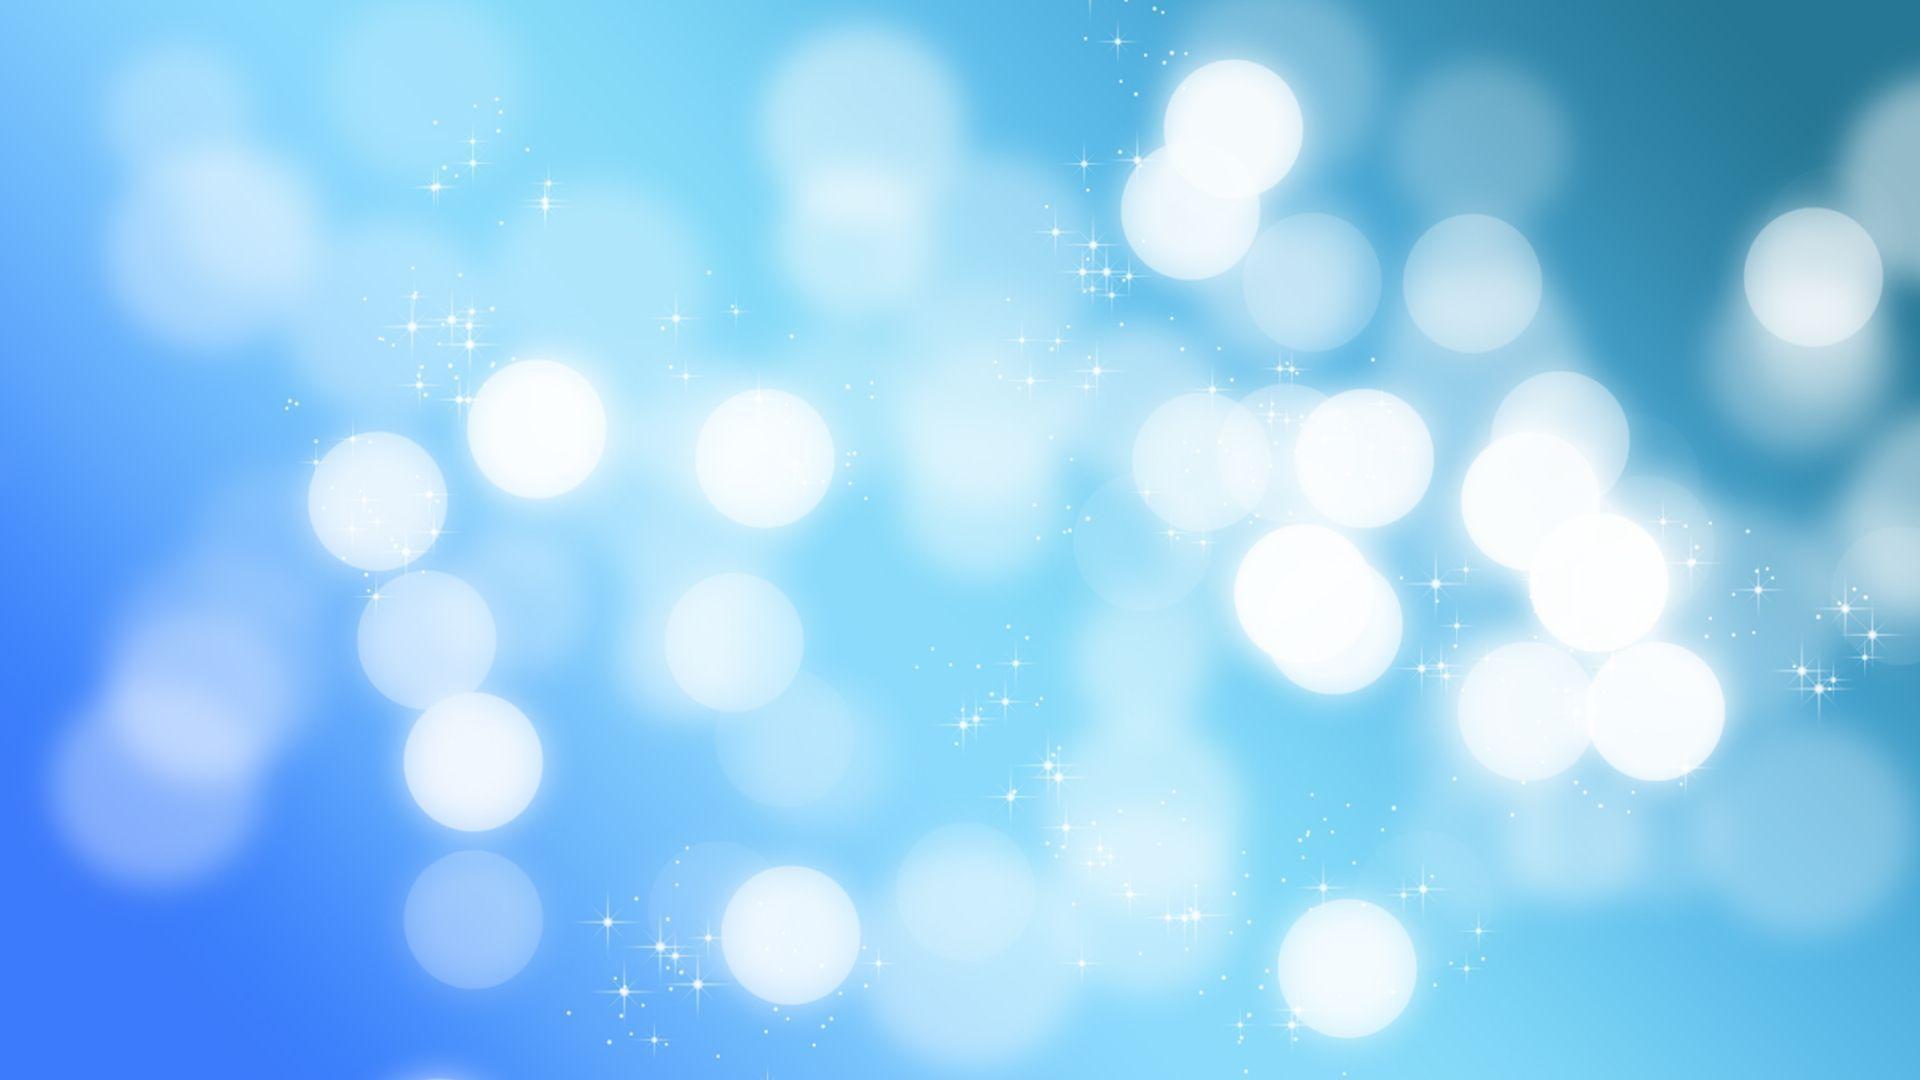 sparkling snow desktop wallpaper - photo #33